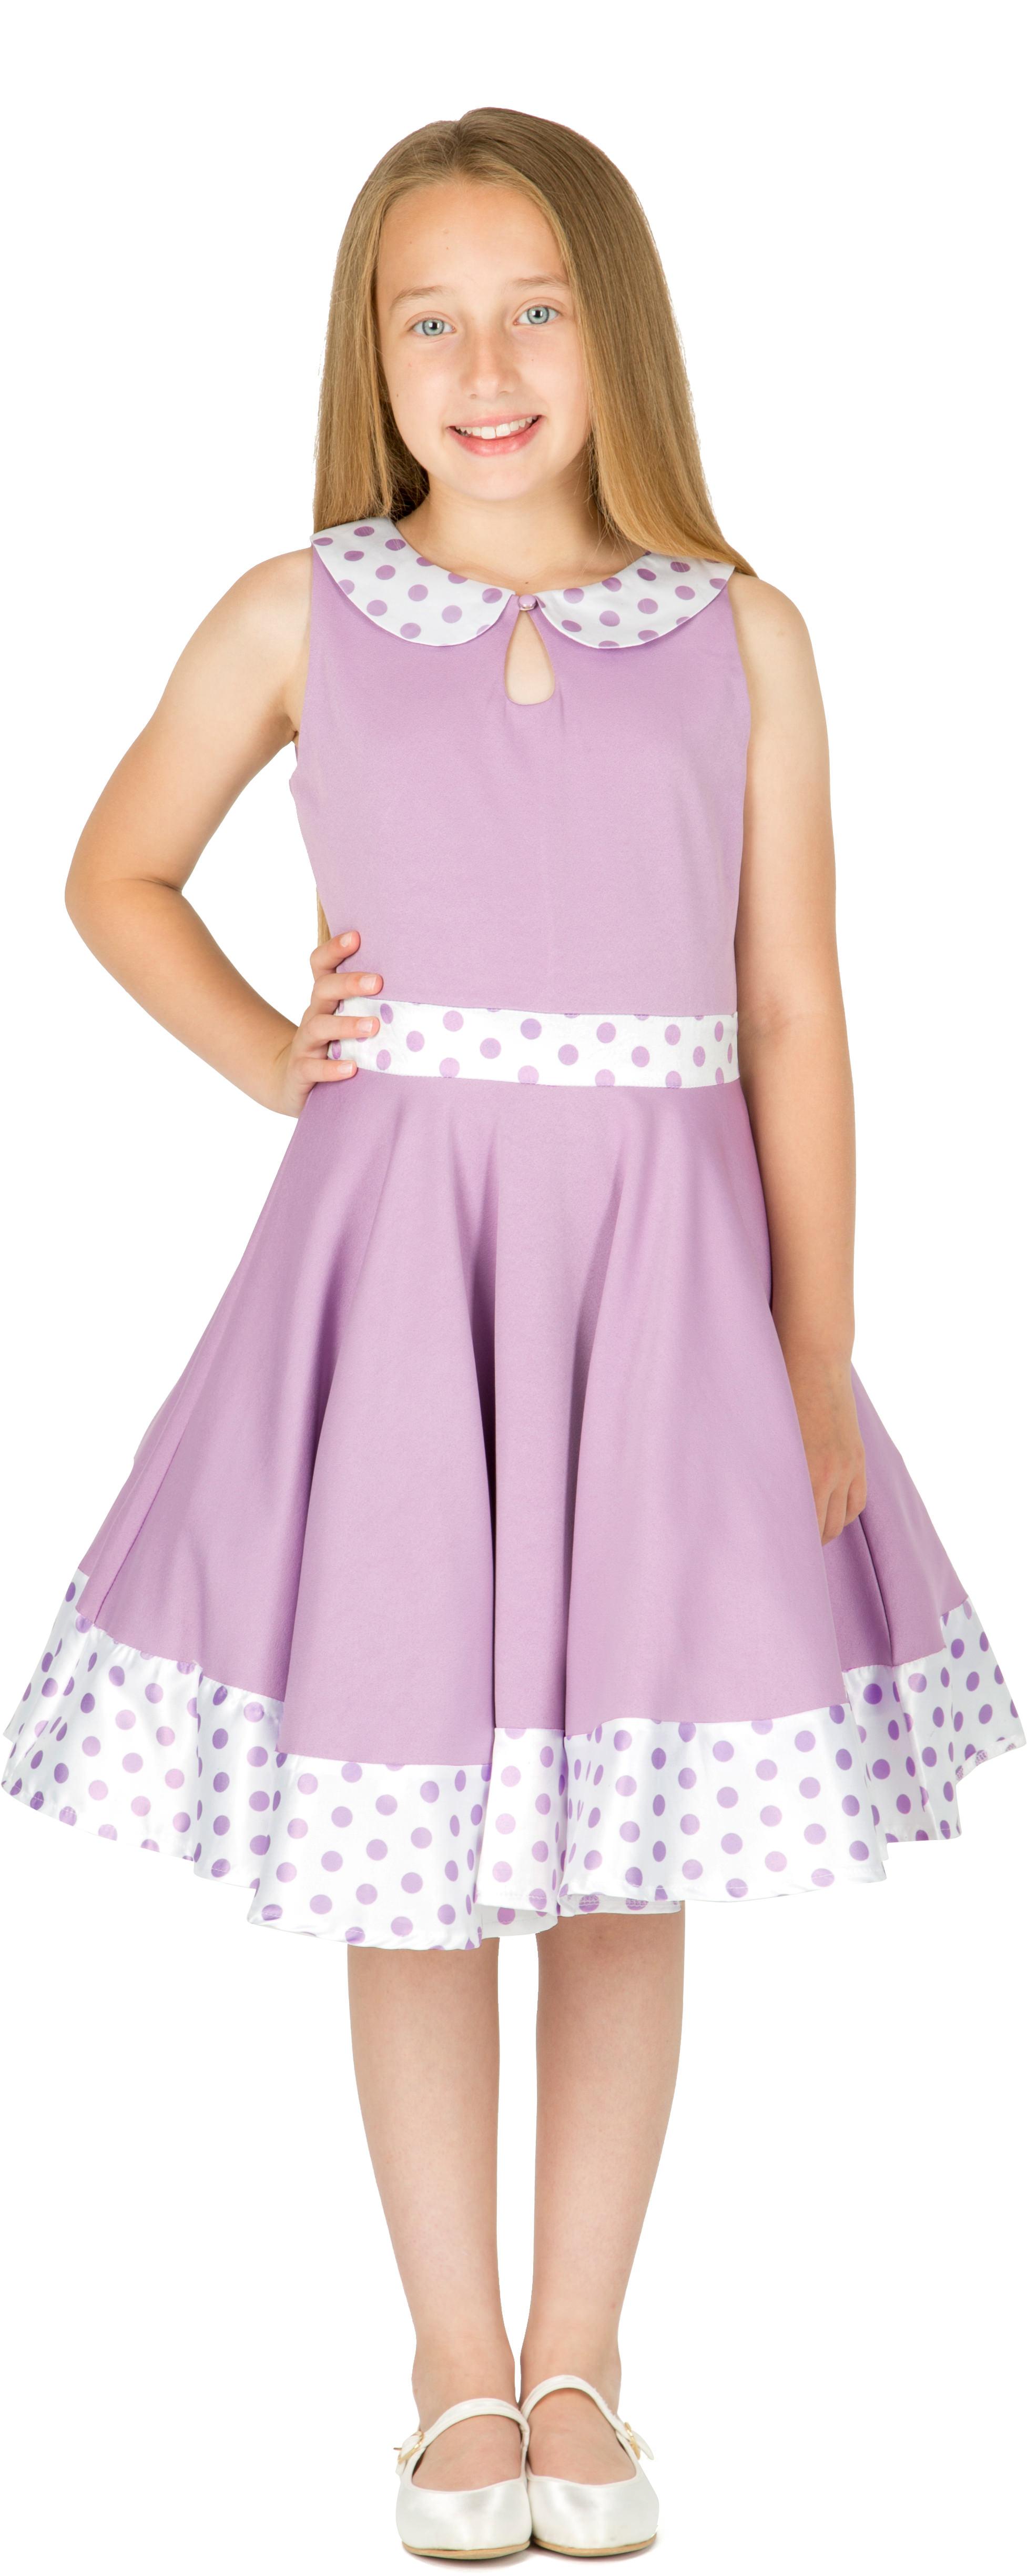 Beautiful Kids /'Zoey/' Vintage Polka Dot 50/'s Party Girls Prom Dress